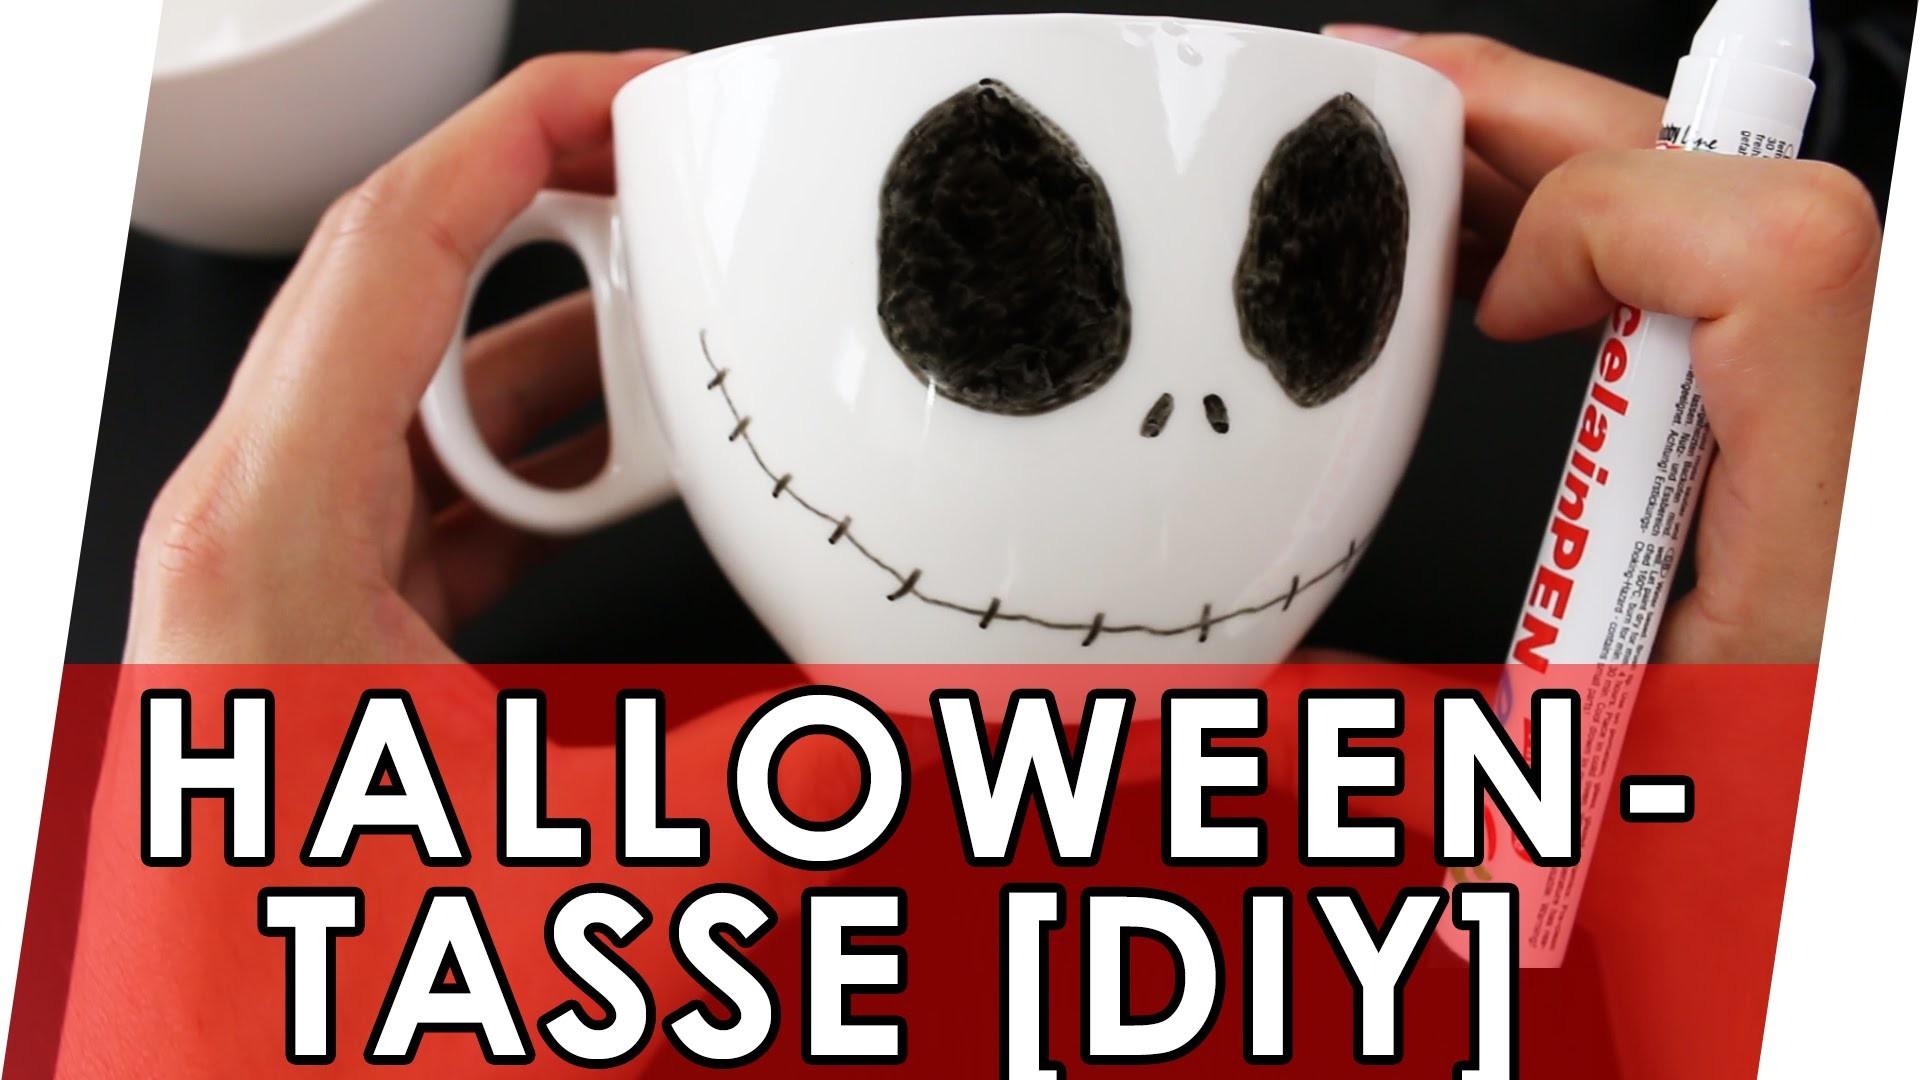 Halloween-Tassen [DIY] | Geniale Fakten, Tipps & Tricks